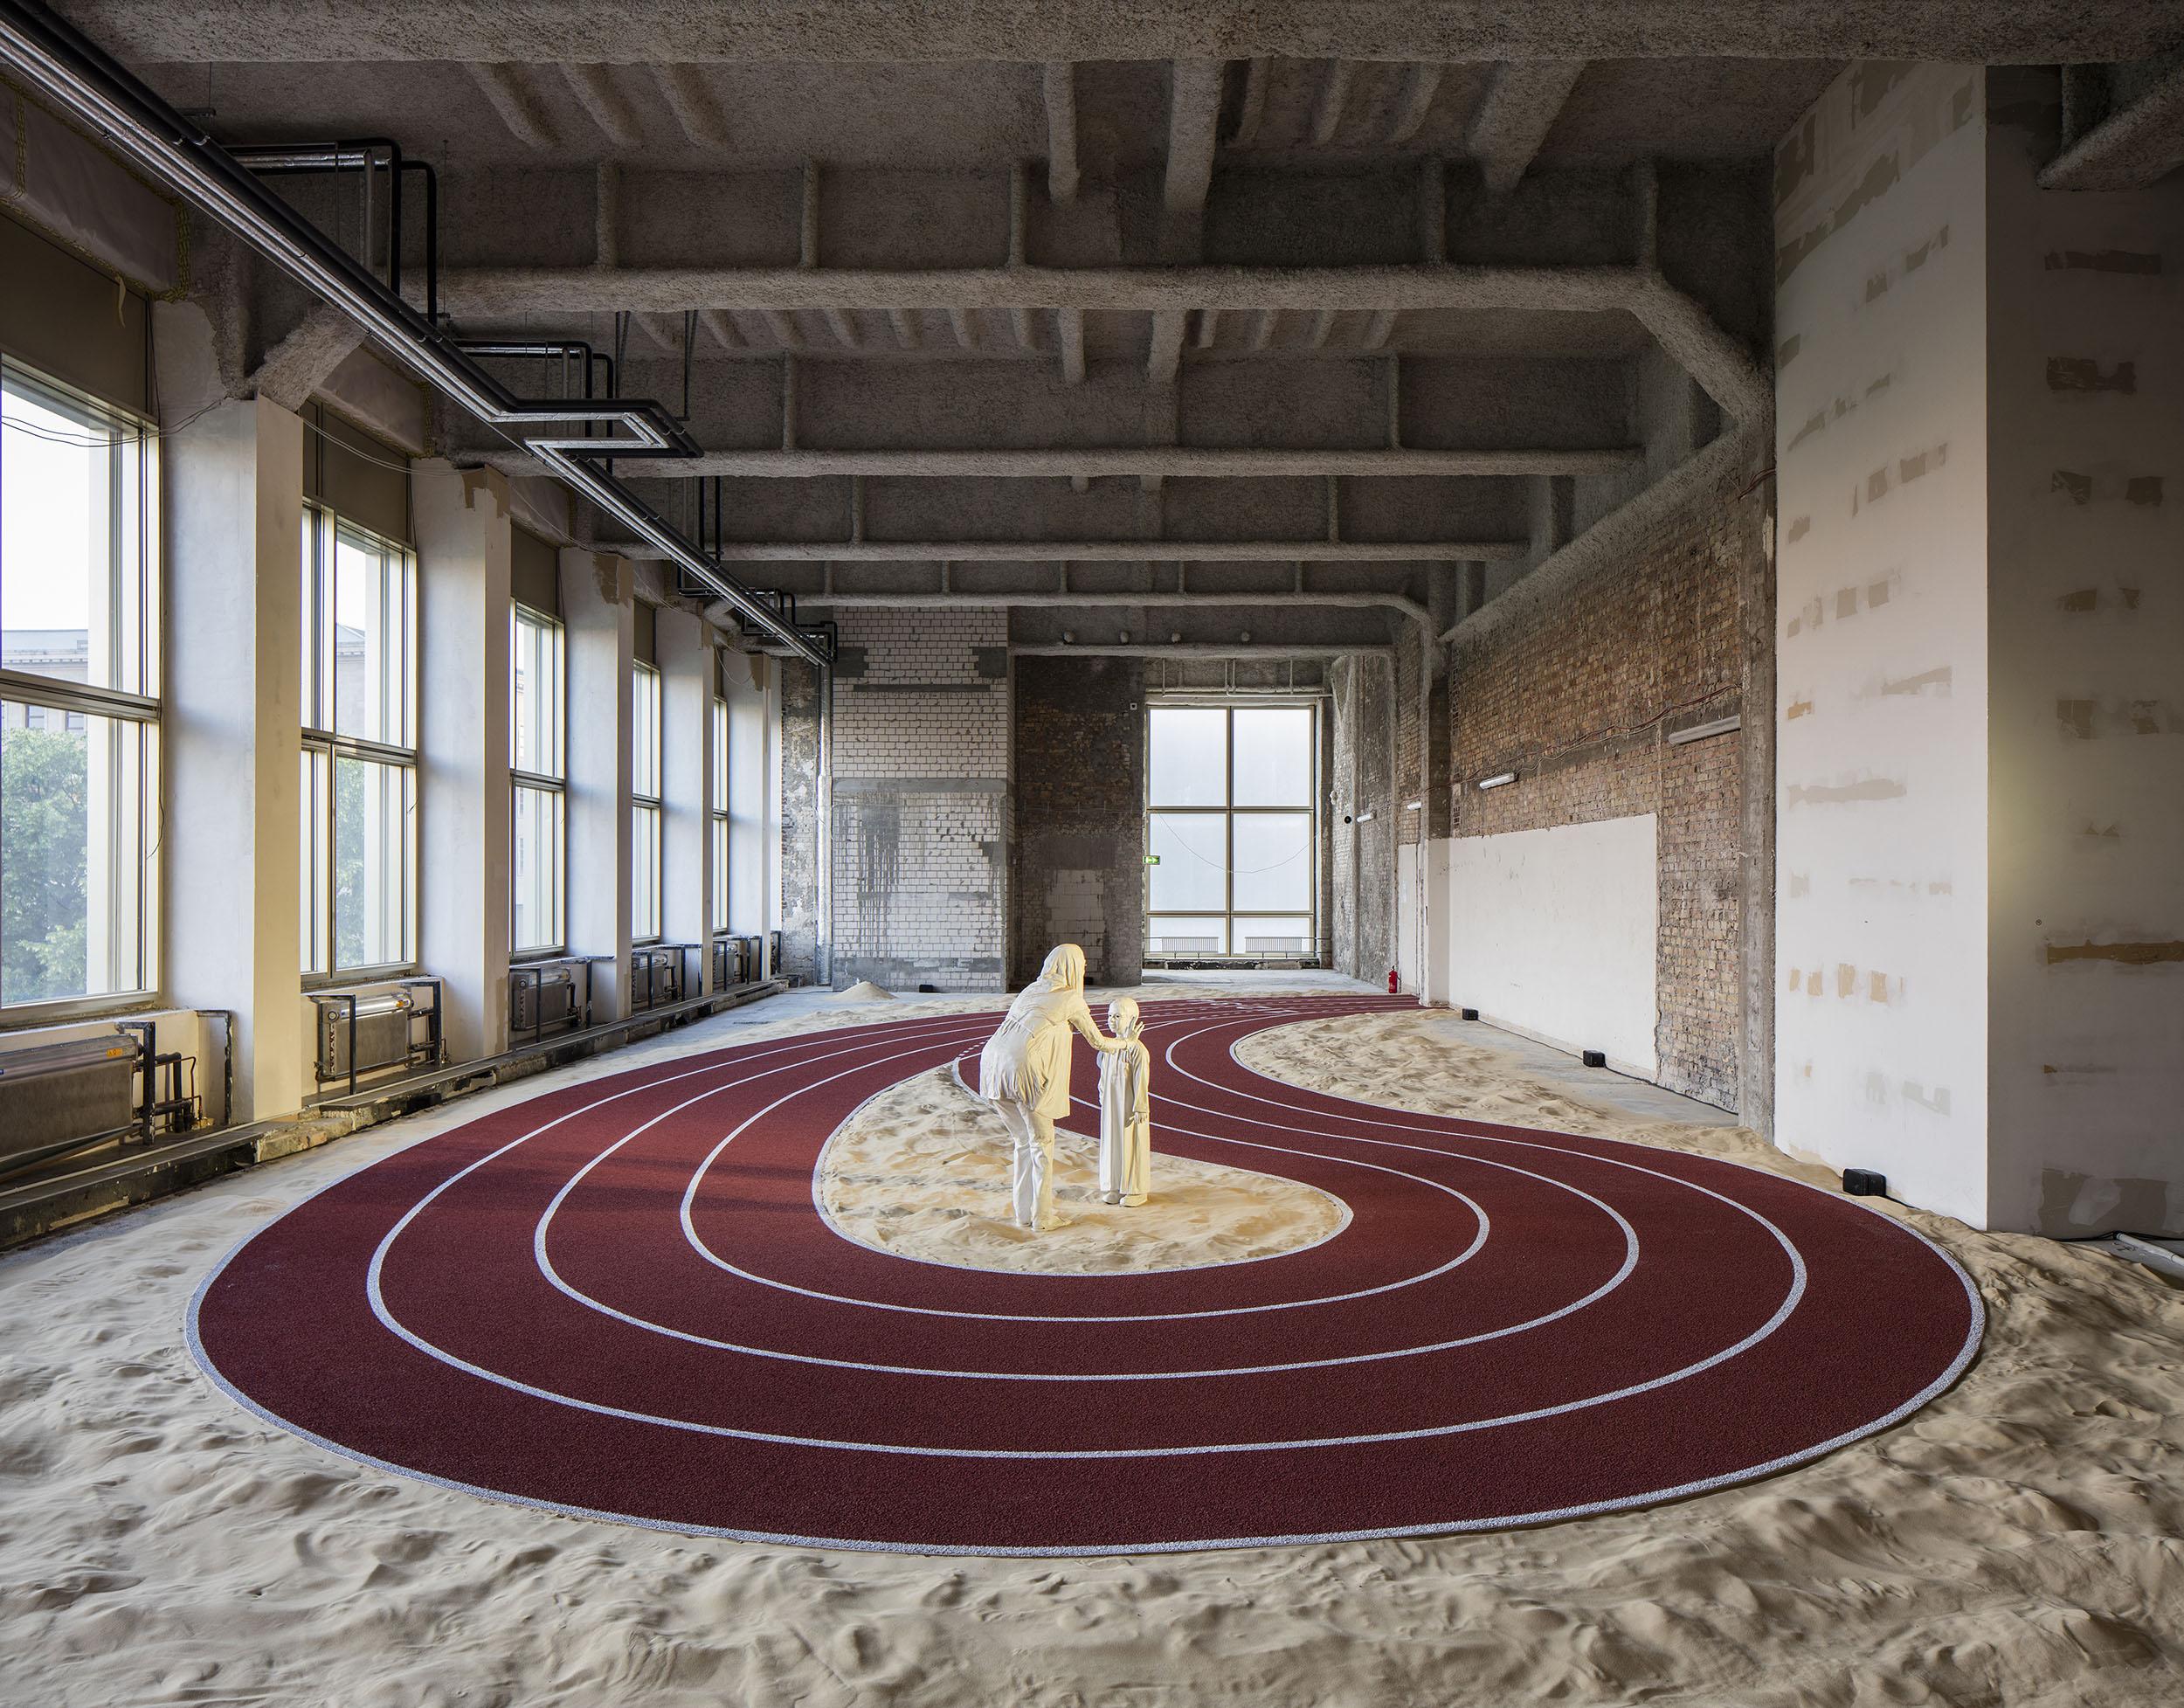 GCC. Positive Pathways, Berlin Biennale 9, 2016